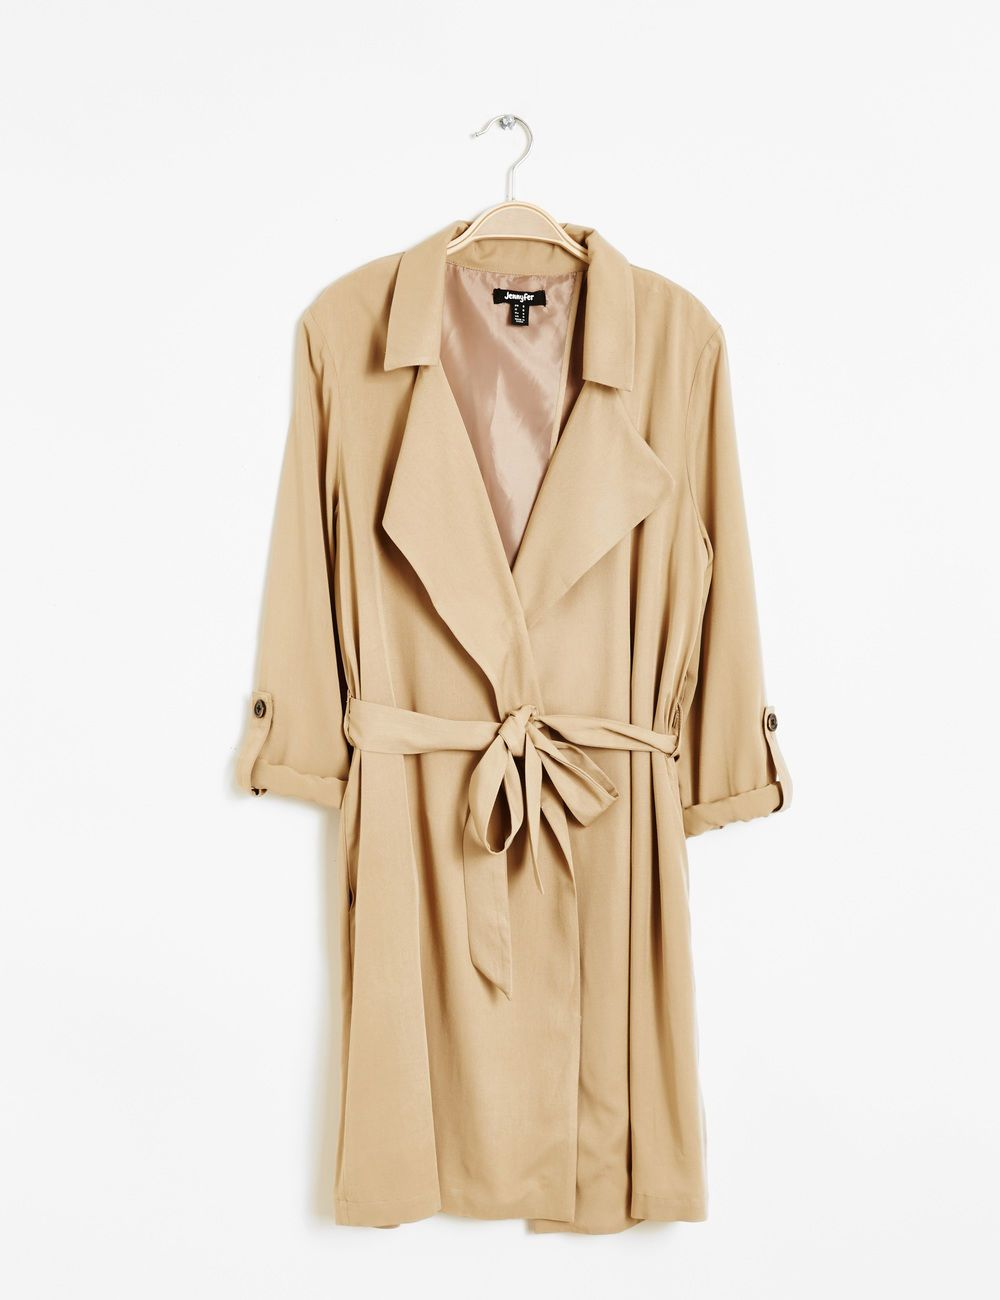 Veste trench femme beige